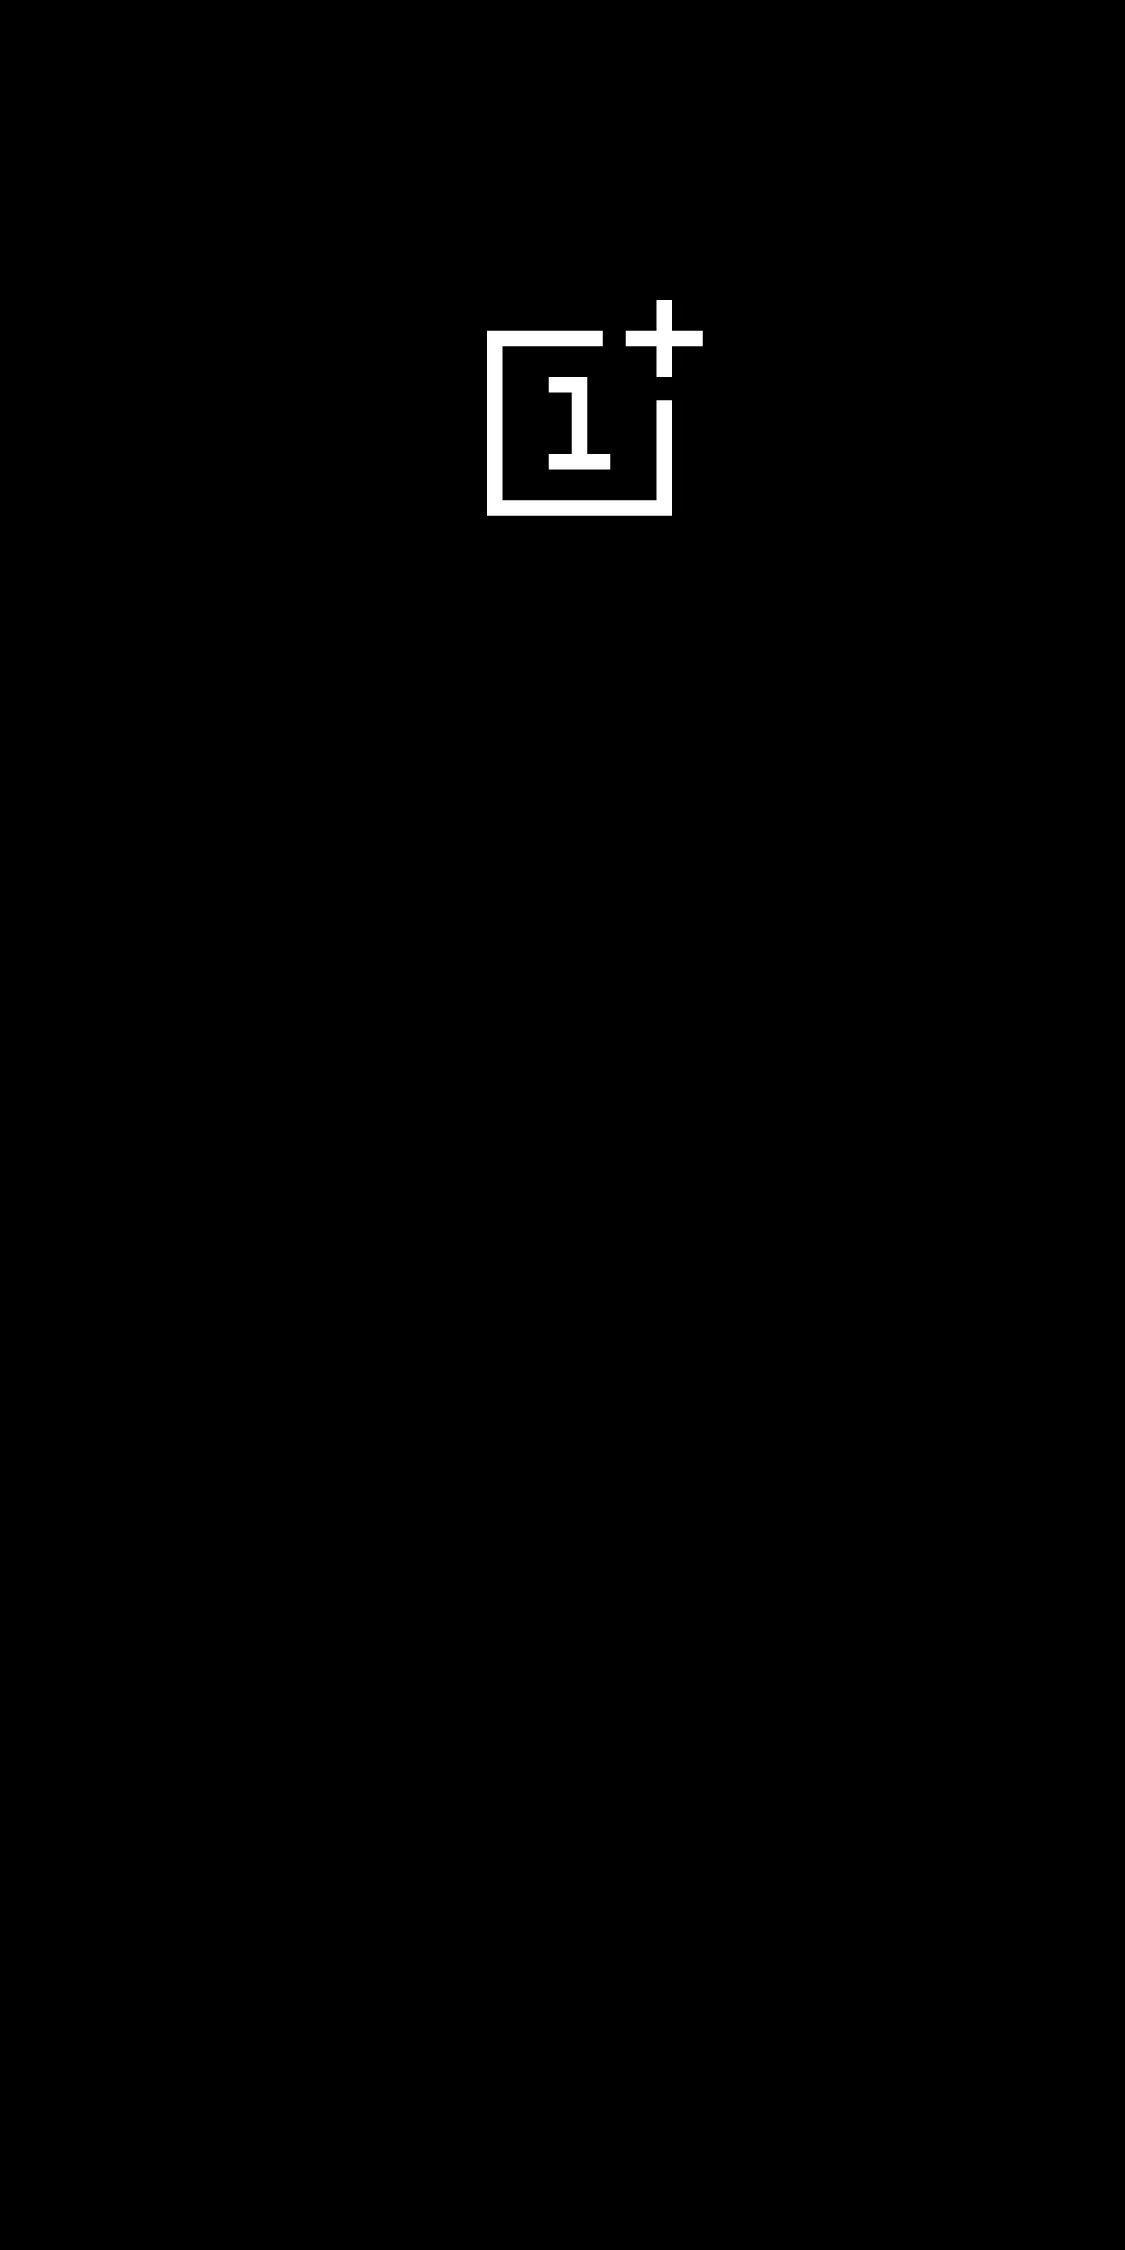 6069f7f77d01c038be4b678cf8b33f7e Jpg 1125 2250 Oneplus Wallpapers Black Hd Wallpaper Logo Wallpaper Hd